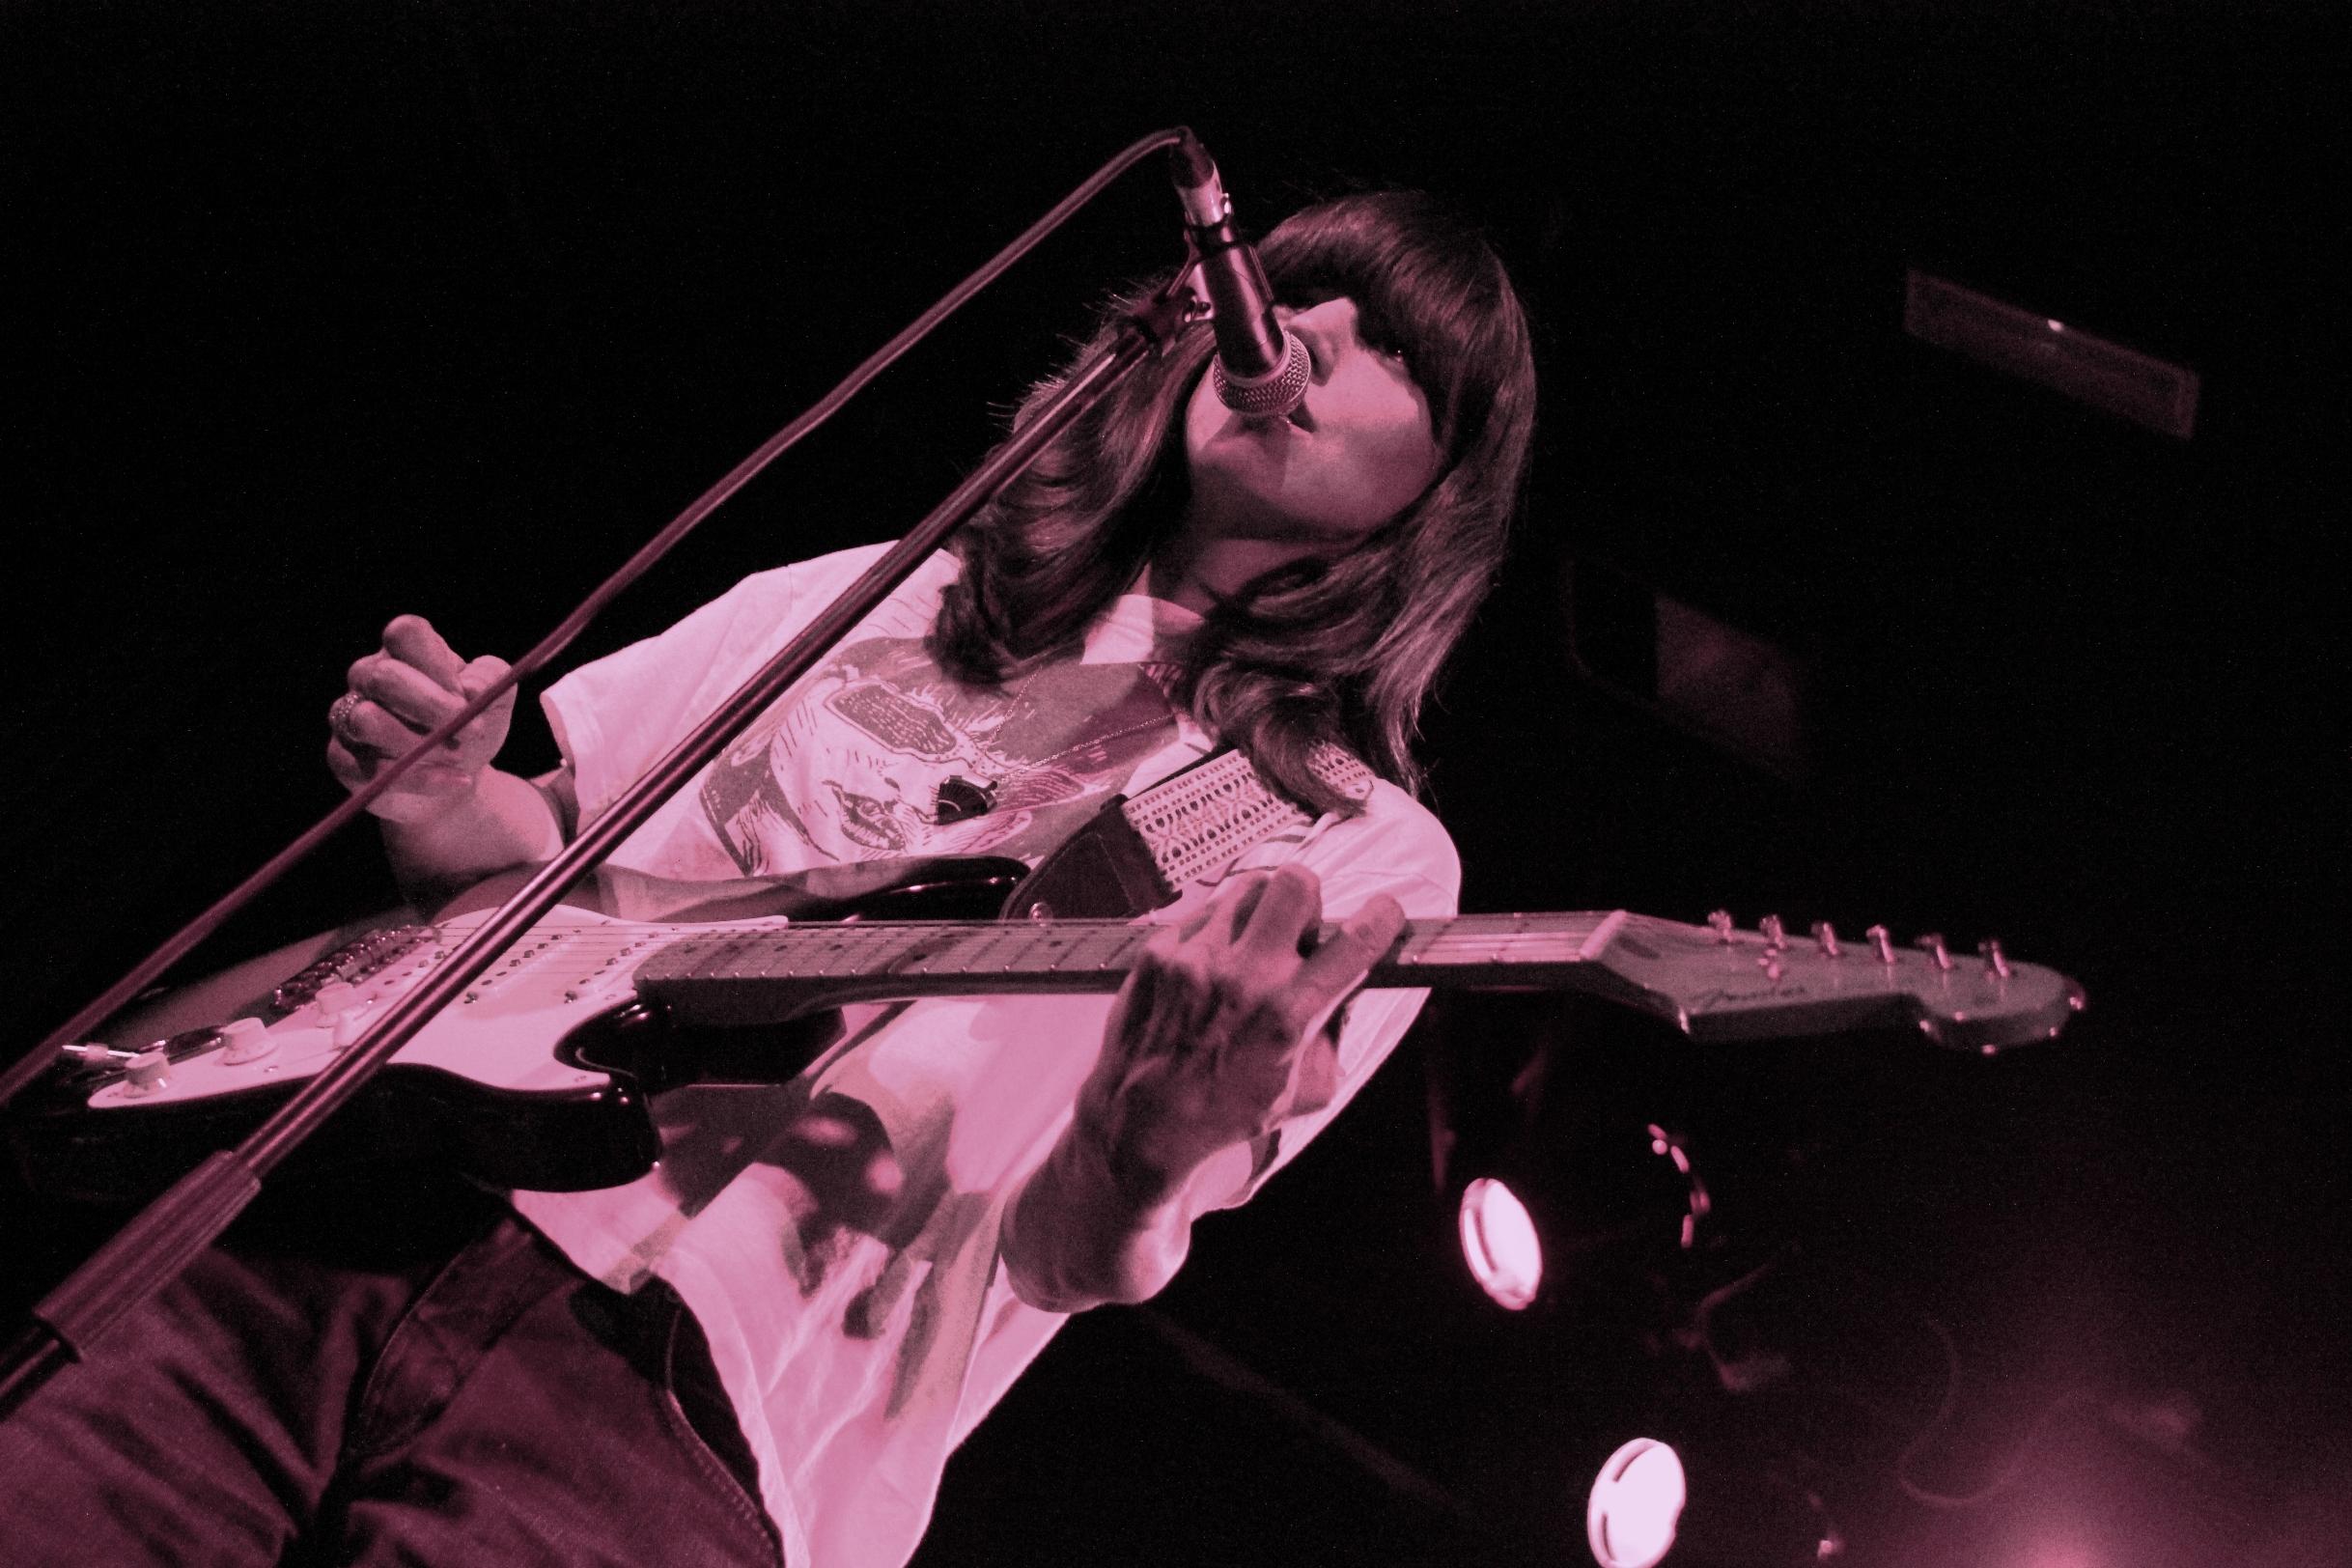 Photo of Eleanor Friedberger + Bill Ryder-Jones (La[2] de Apolo, Barcelona, 02-10-2013)